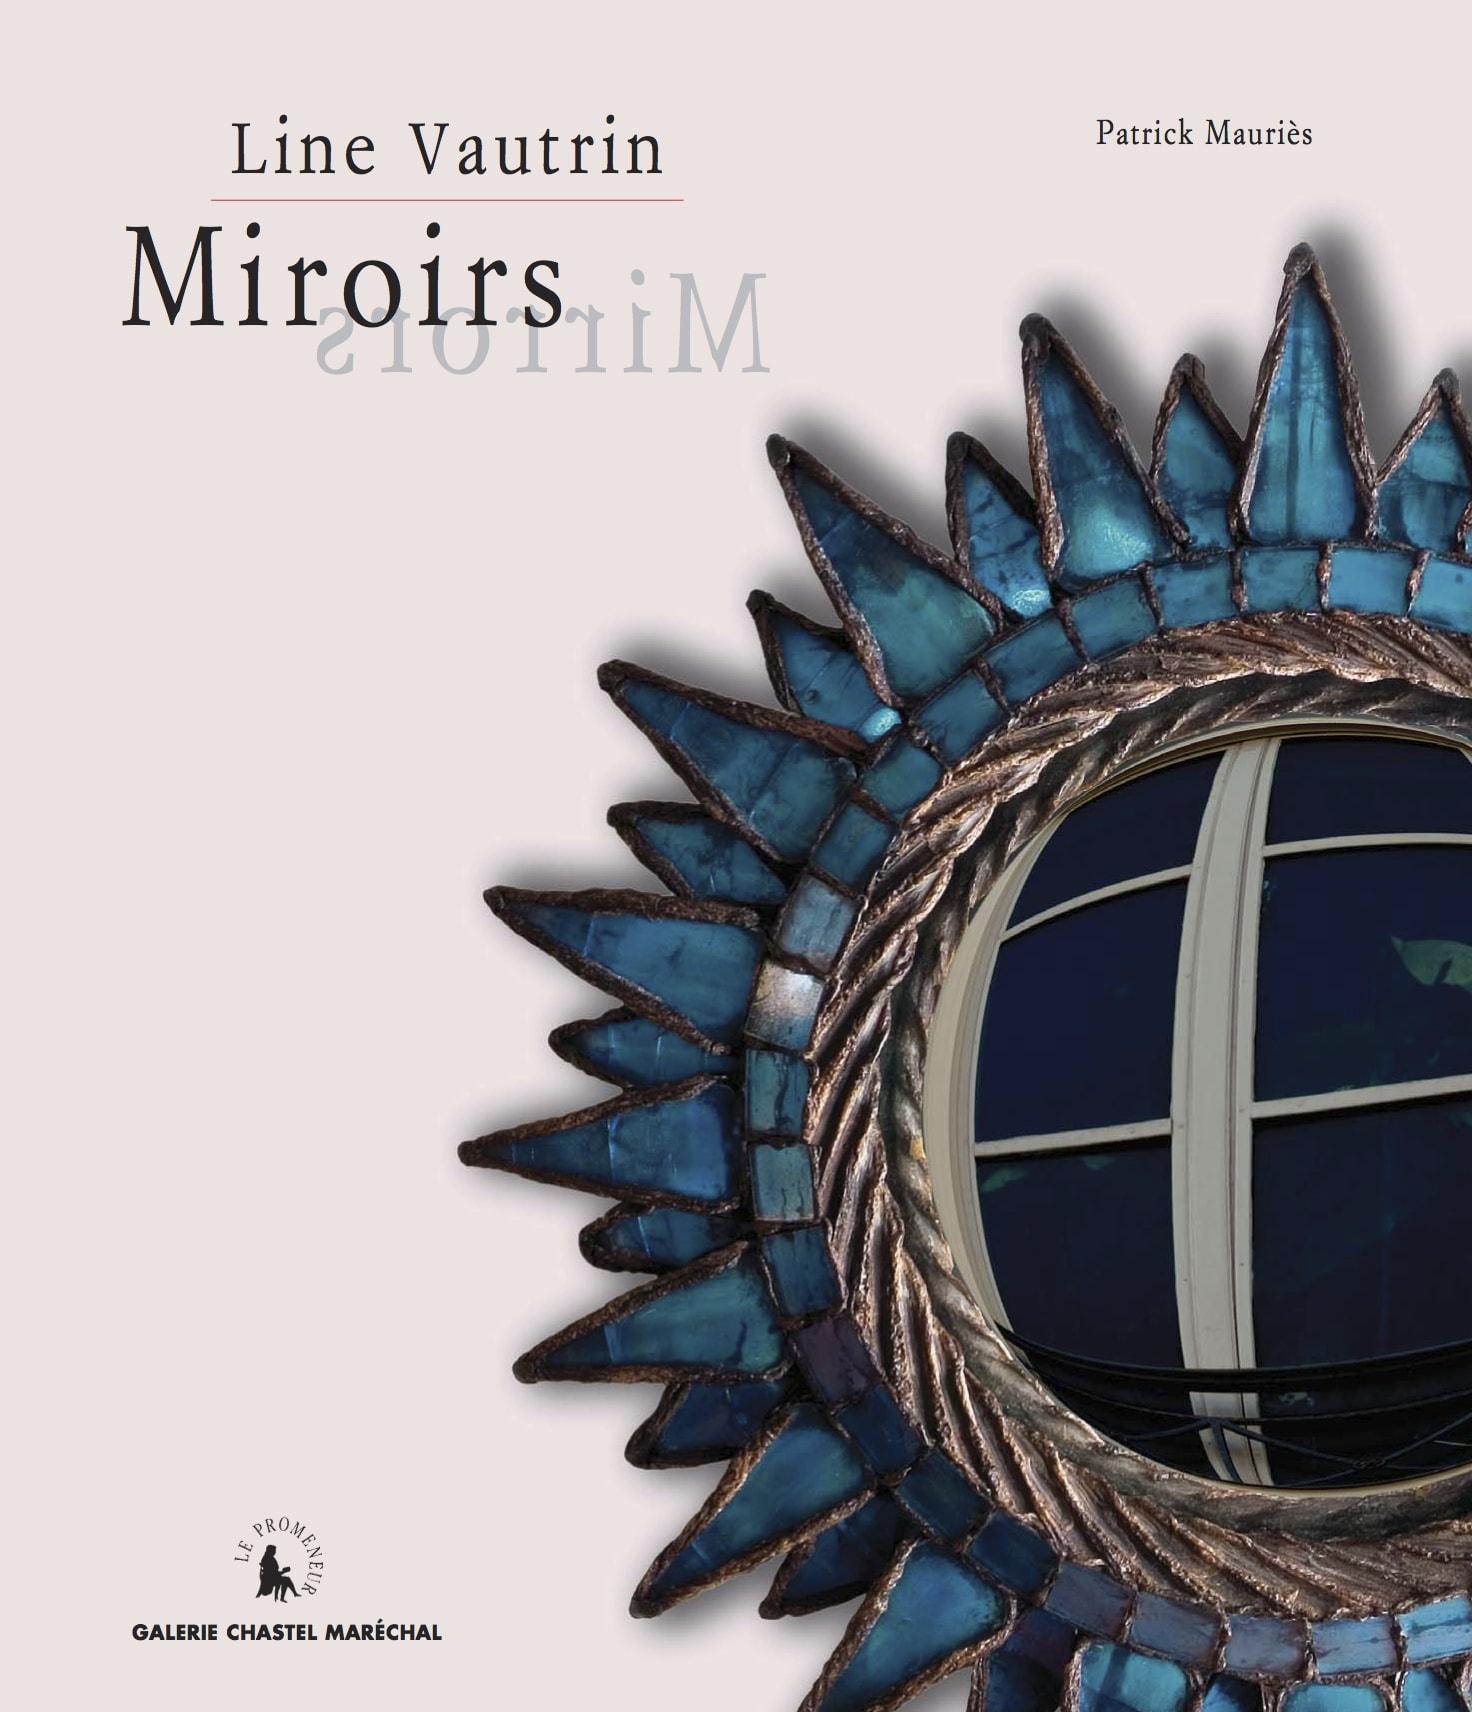 Line Vautrin miroir, Miroir, Line Vautrin, book, Patrick Mauriès, Mauriès, Le promeneur, edition, chastel maréchal, galerie Chastel-Maréchal